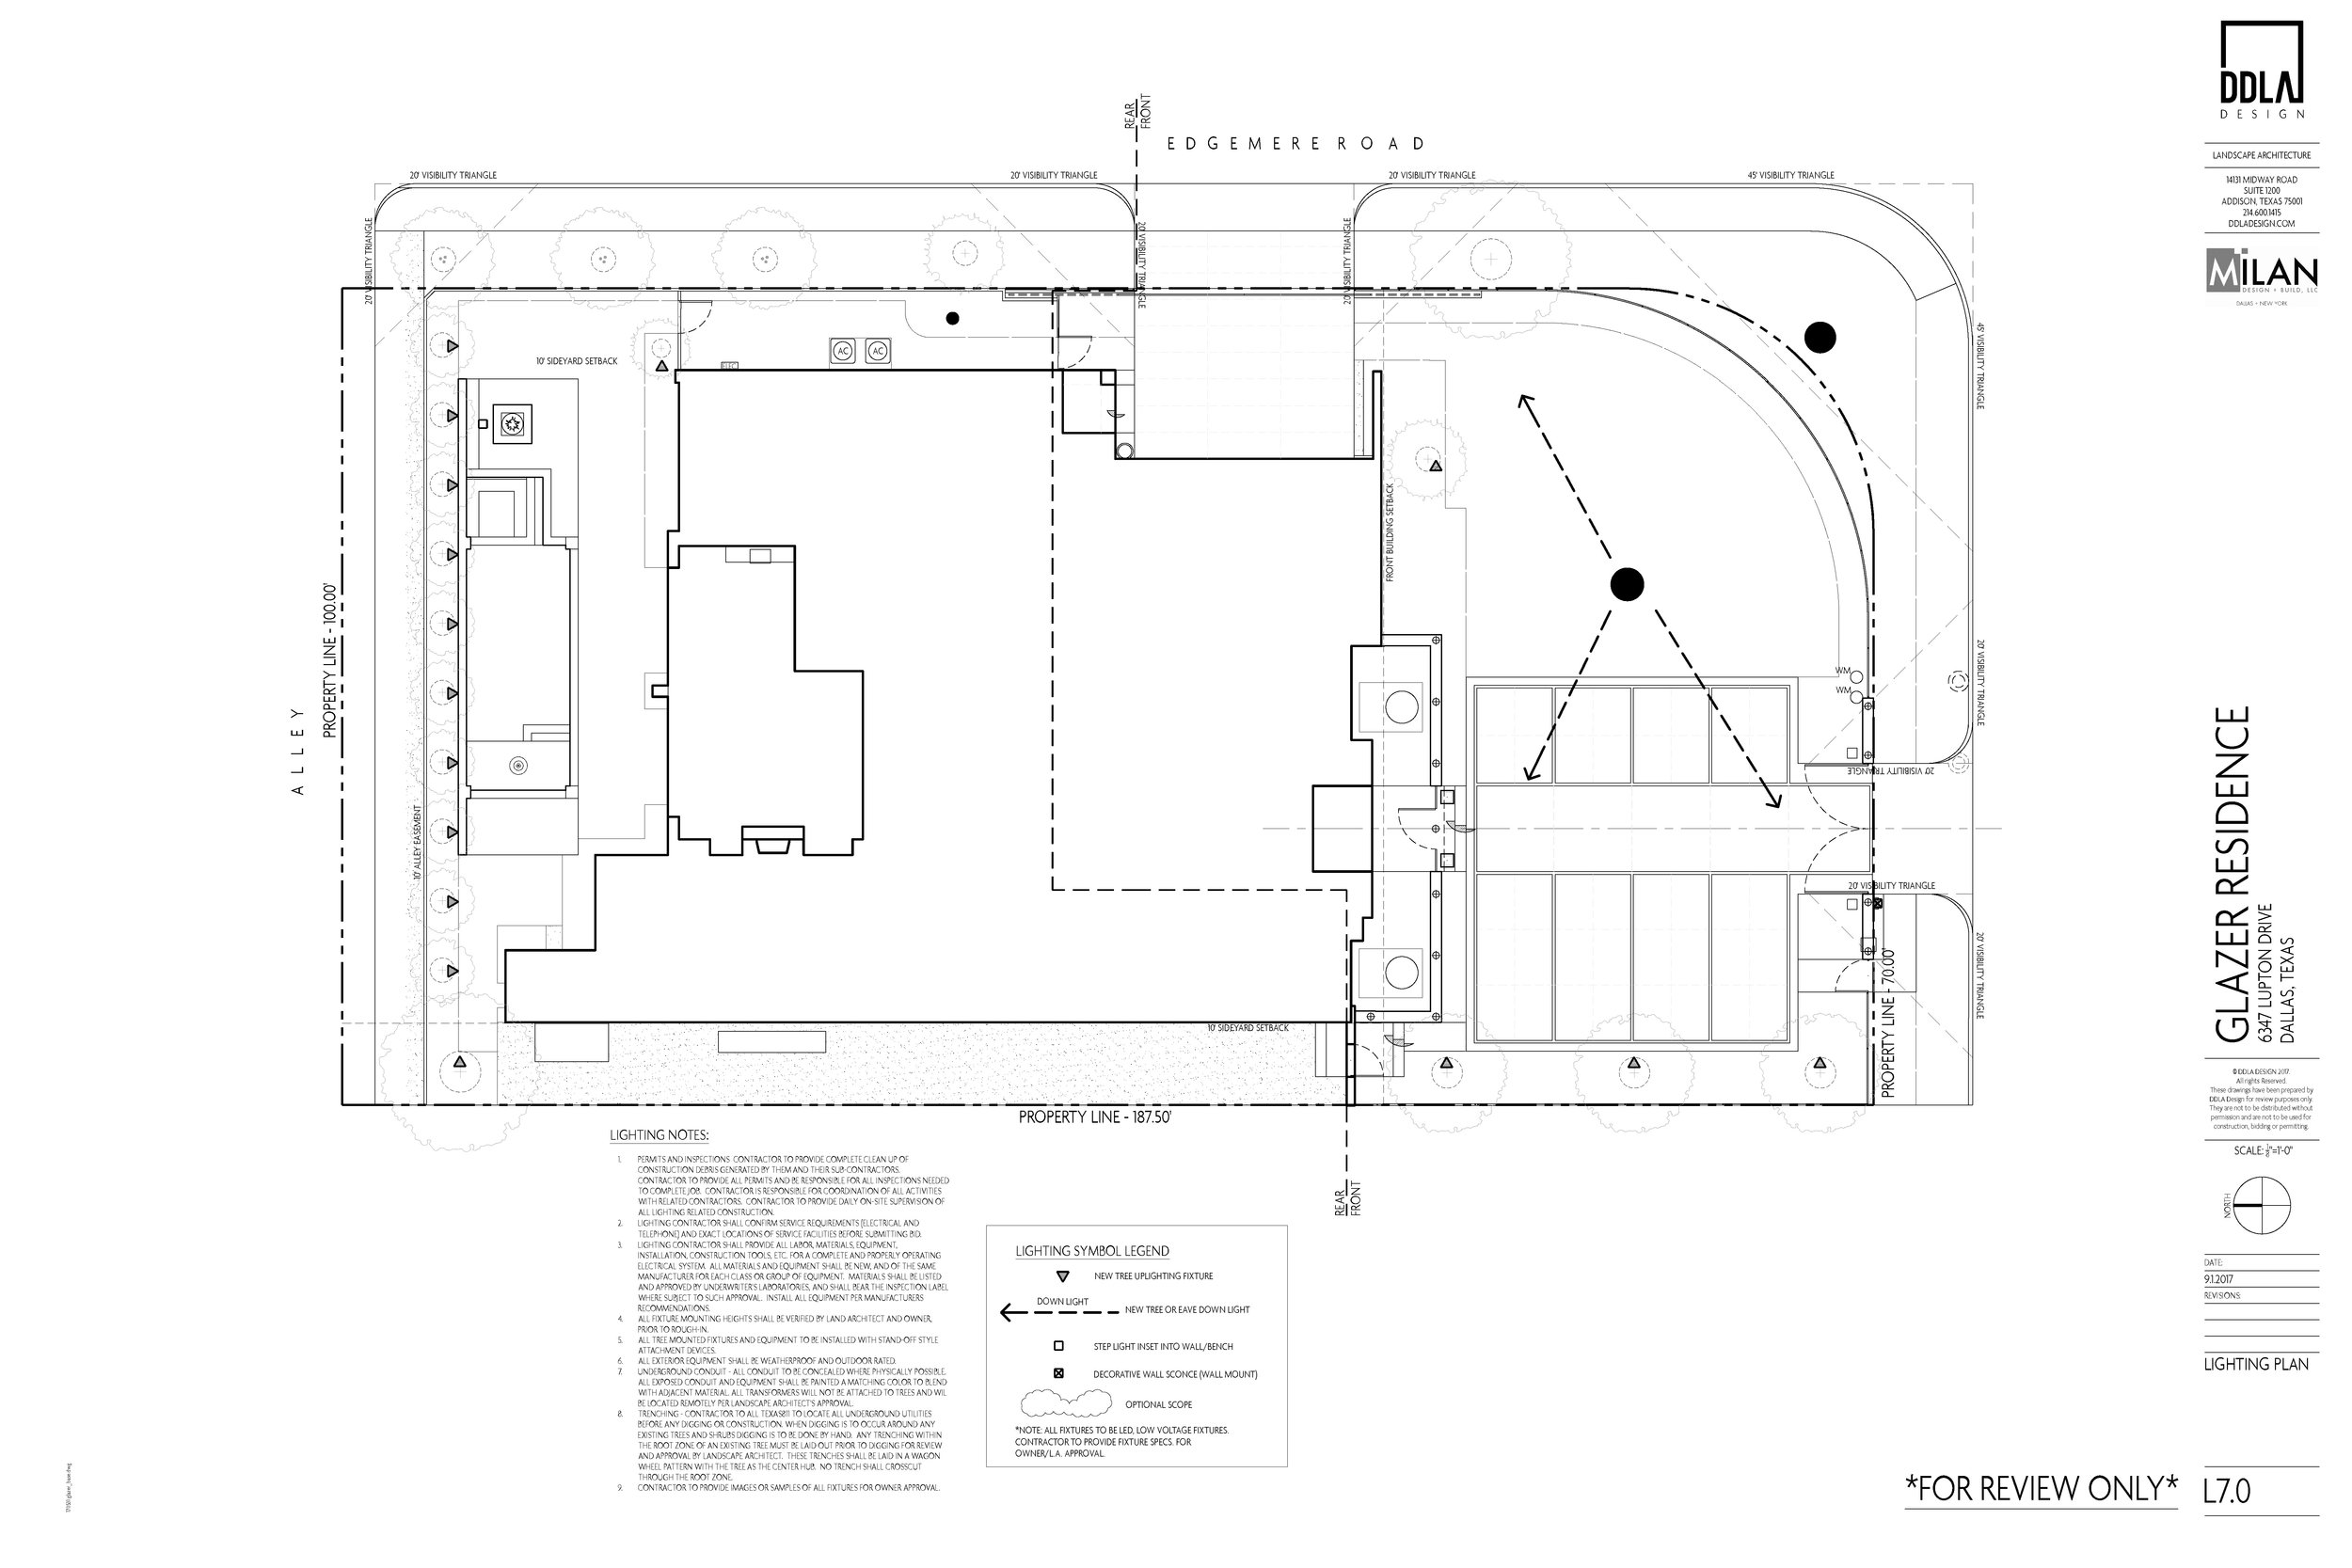 170901 glazer_cd drawing set_Page_8.jpg